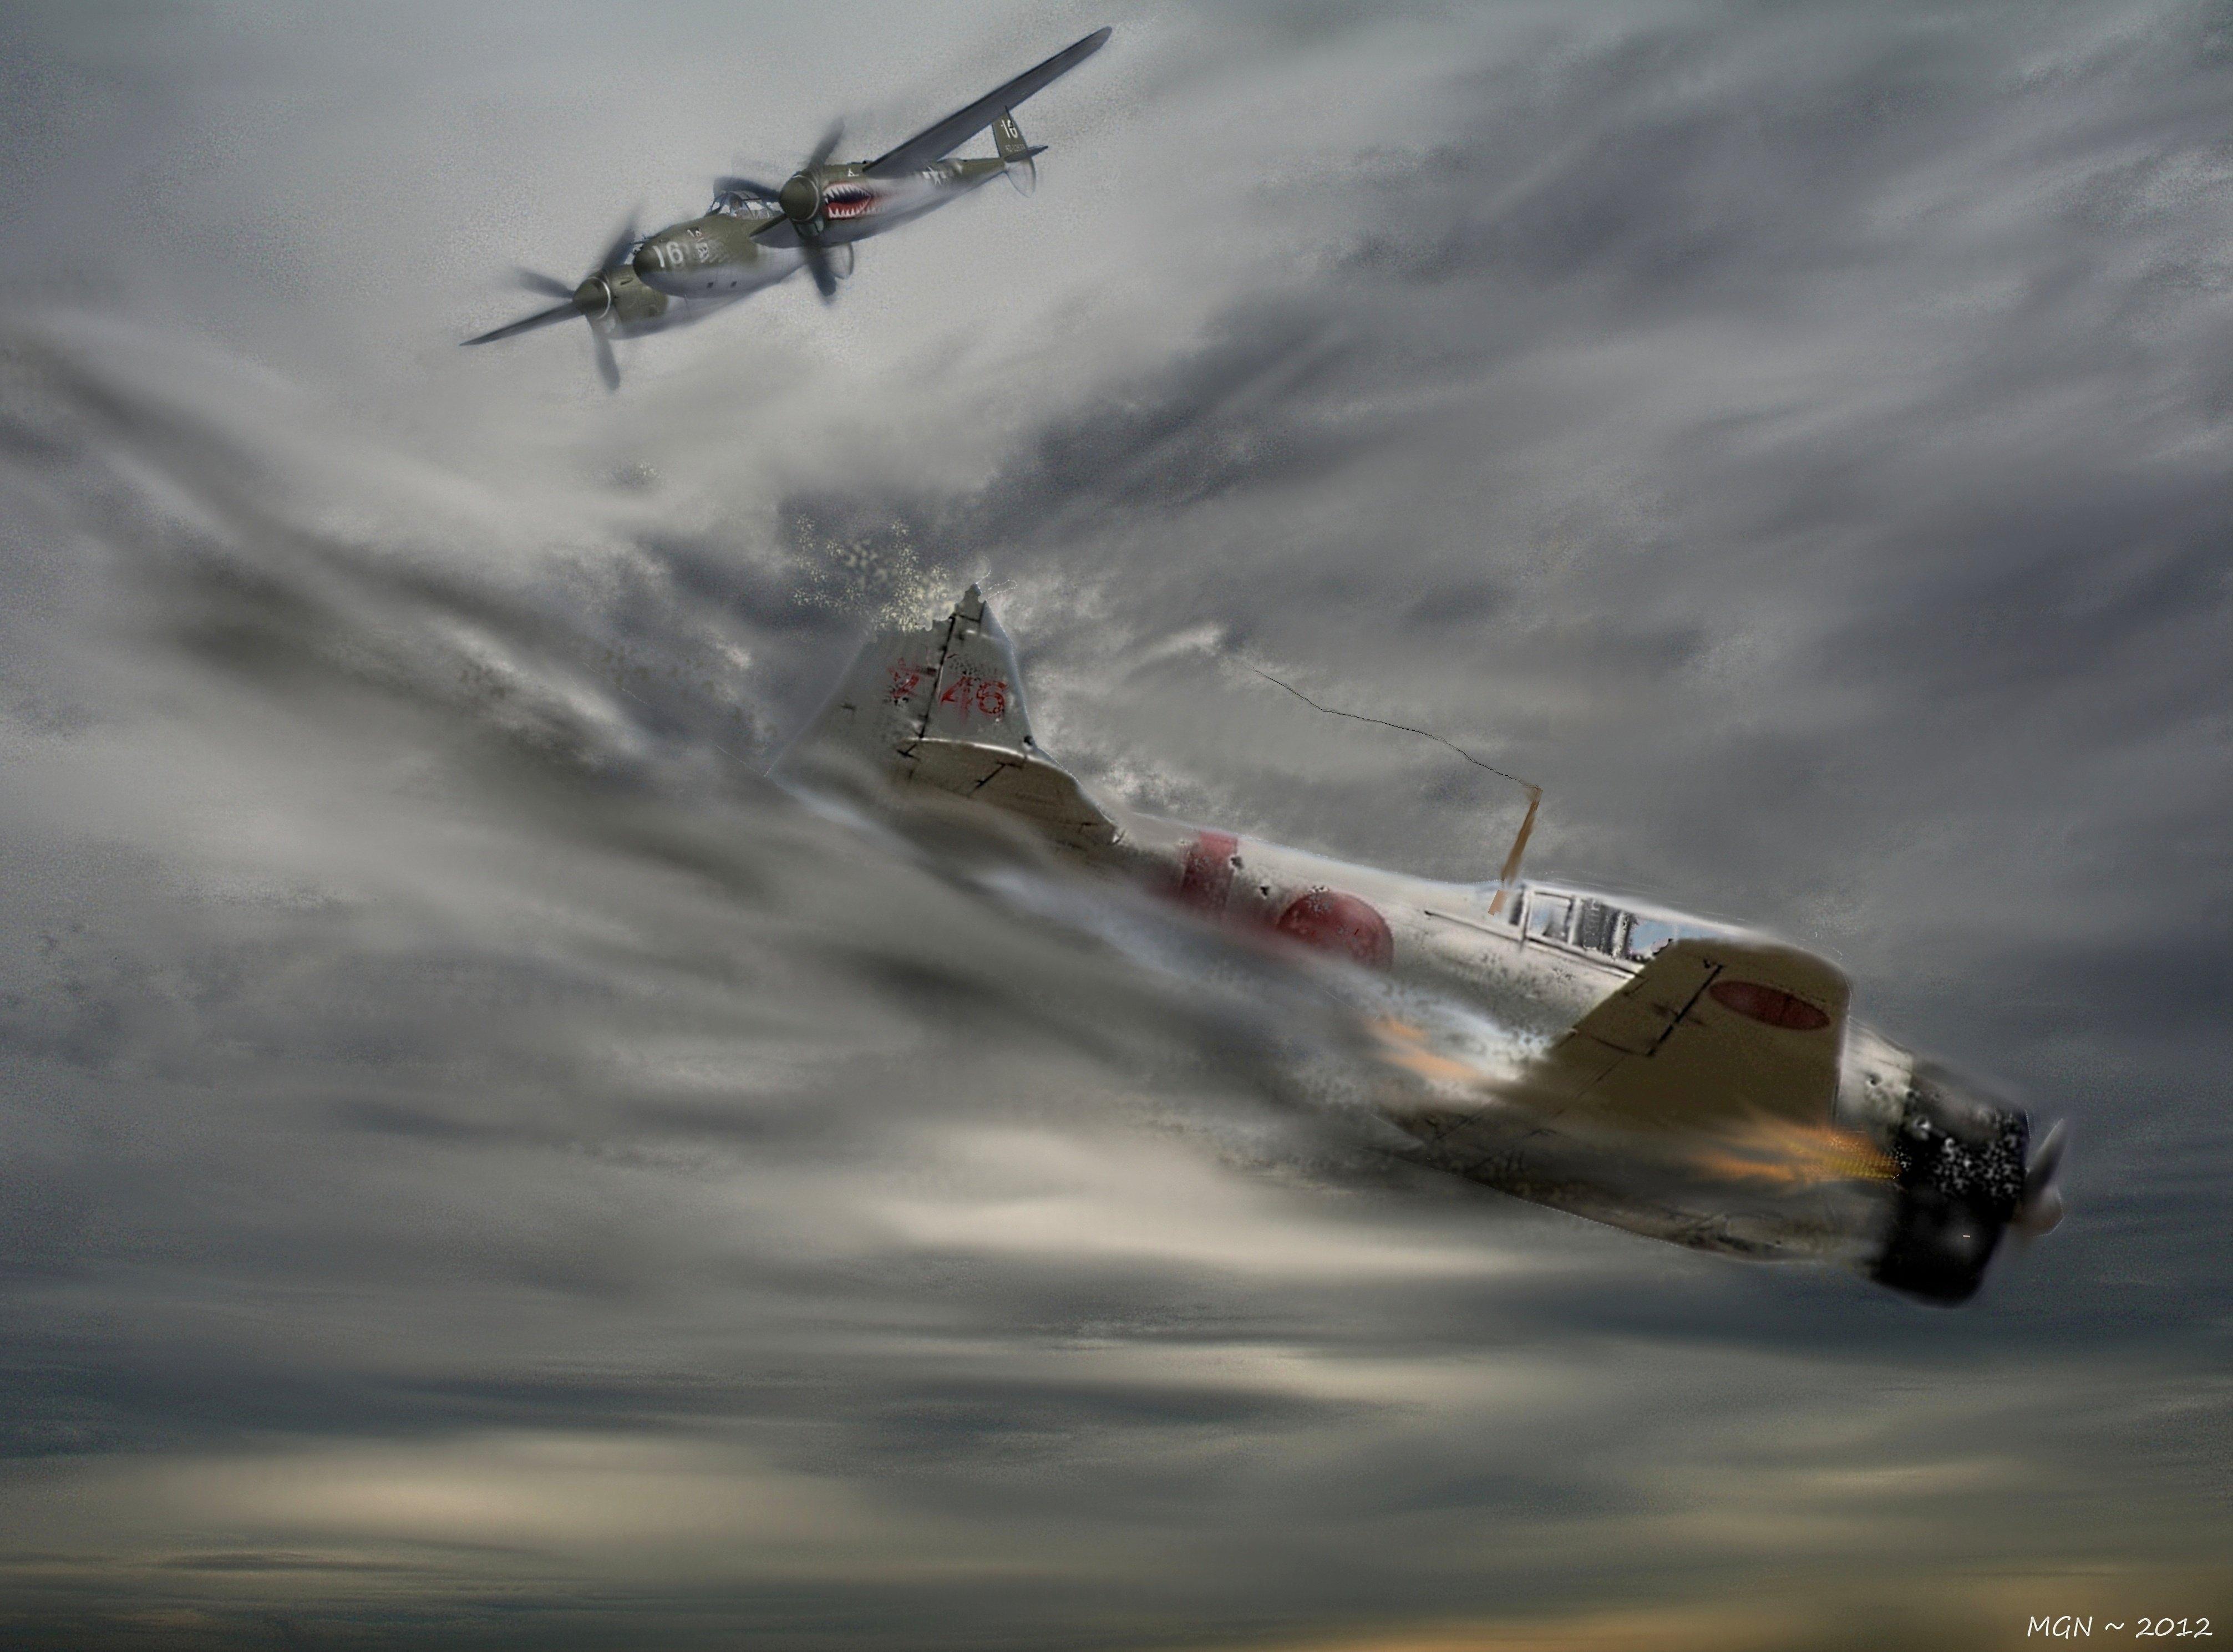 Drawn aircraft ww2 airplane Art military 4026x2979 Aviation war